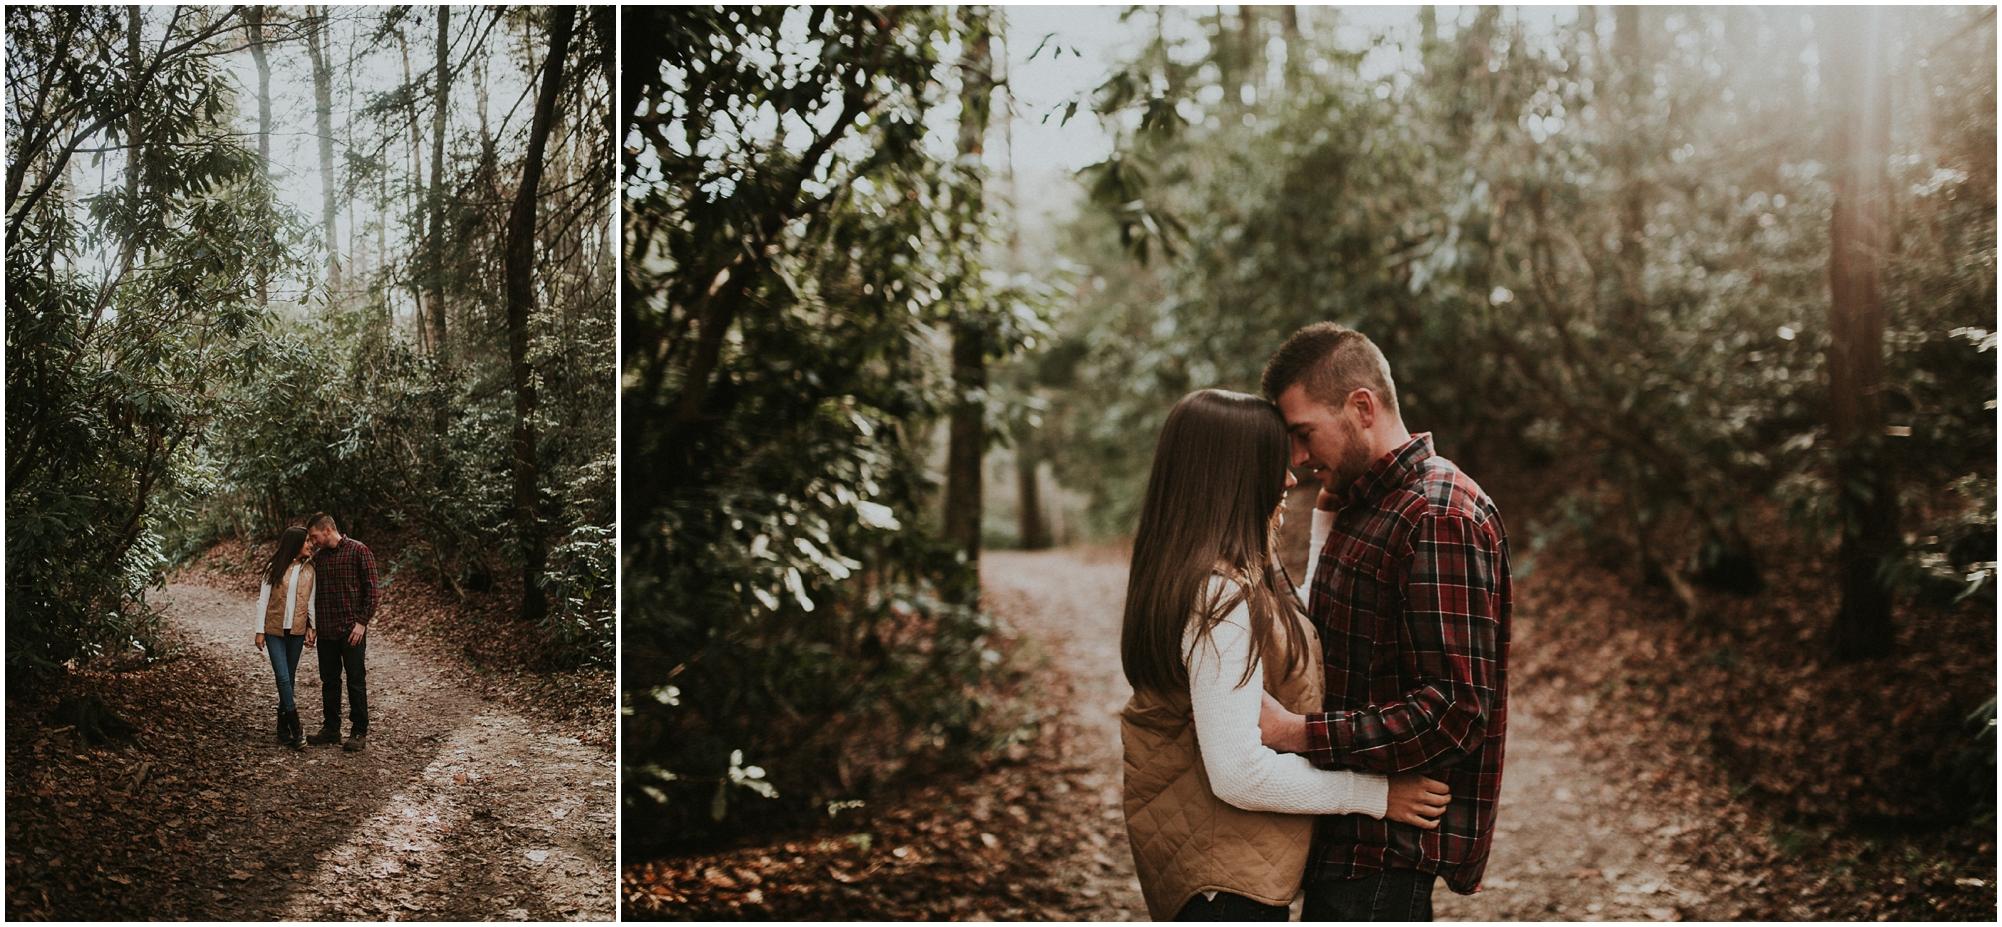 Linville-Falls-Engagement-avonne-Photography-12.jpg